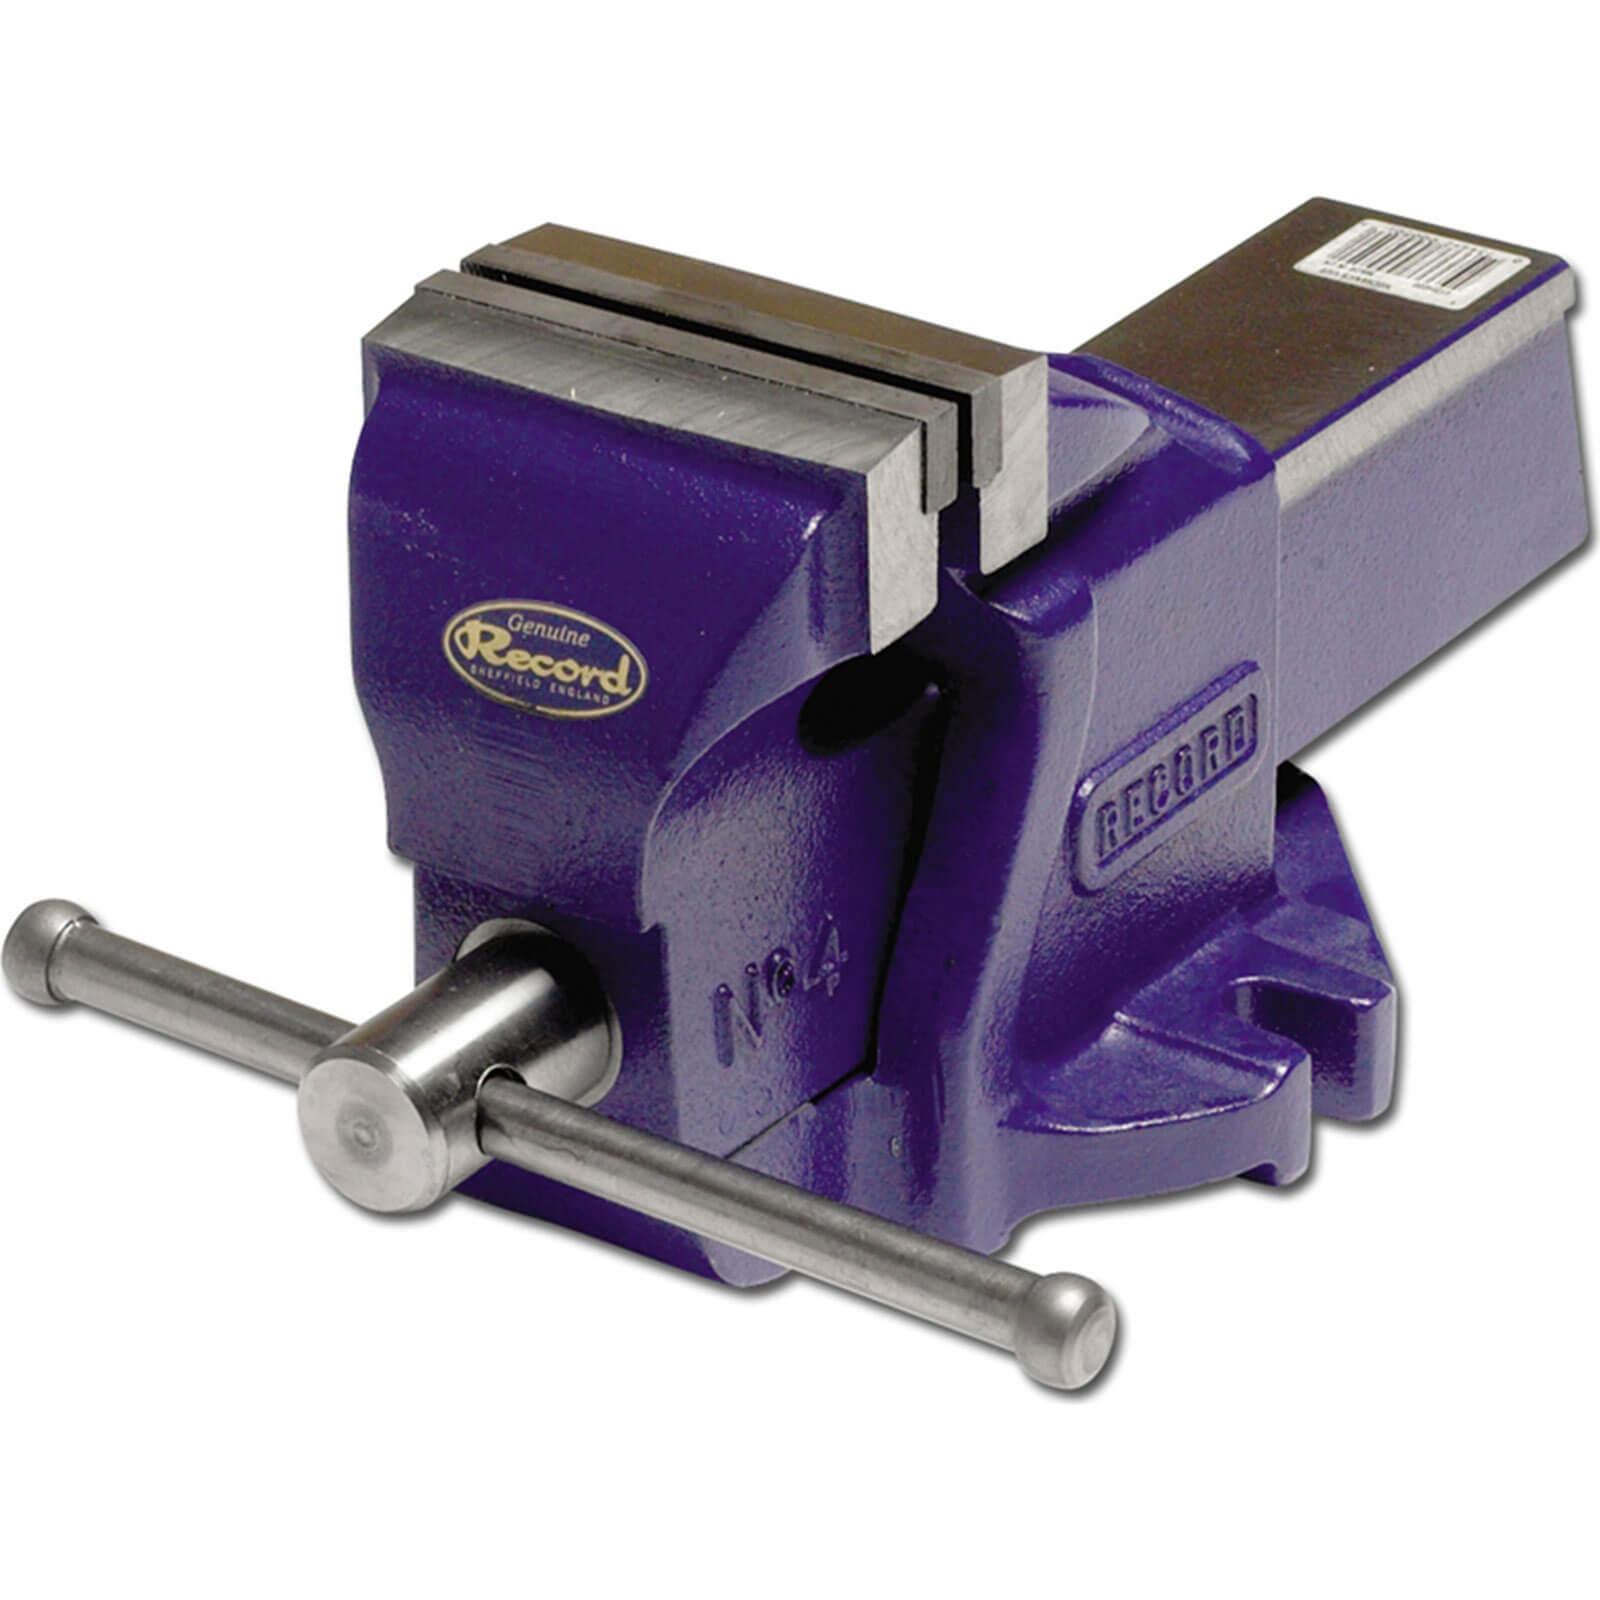 Image of Irwin Record Mechanics Vice 125mm